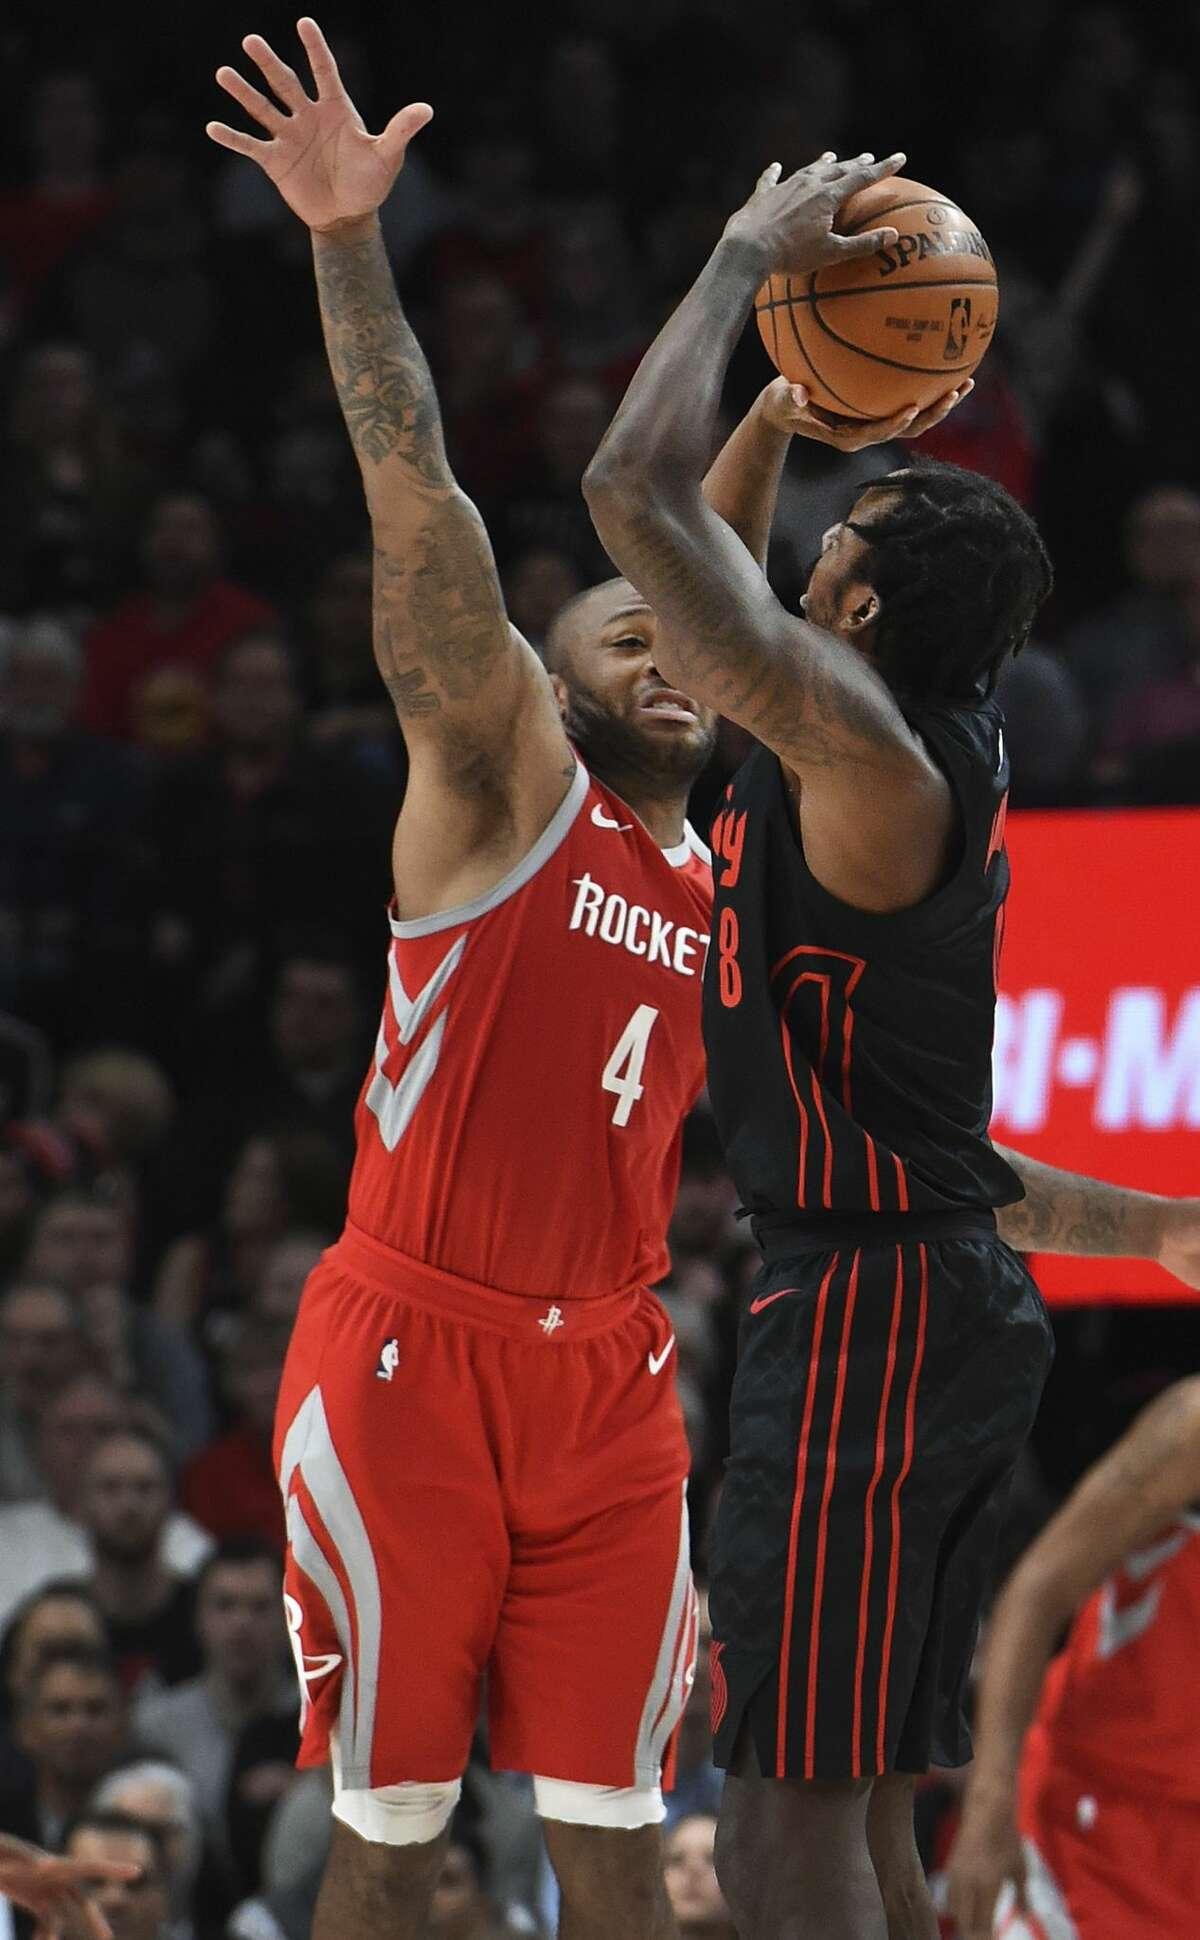 Portland Trail Blazers forward Al-Farouq Aminu hits a 3-point shot over Houston Rockets forward PJ Tucker during the first half of an NBA basketball game in Portland, Ore., Tuesday, March 20, 2018. (AP Photo/Steve Dykes)